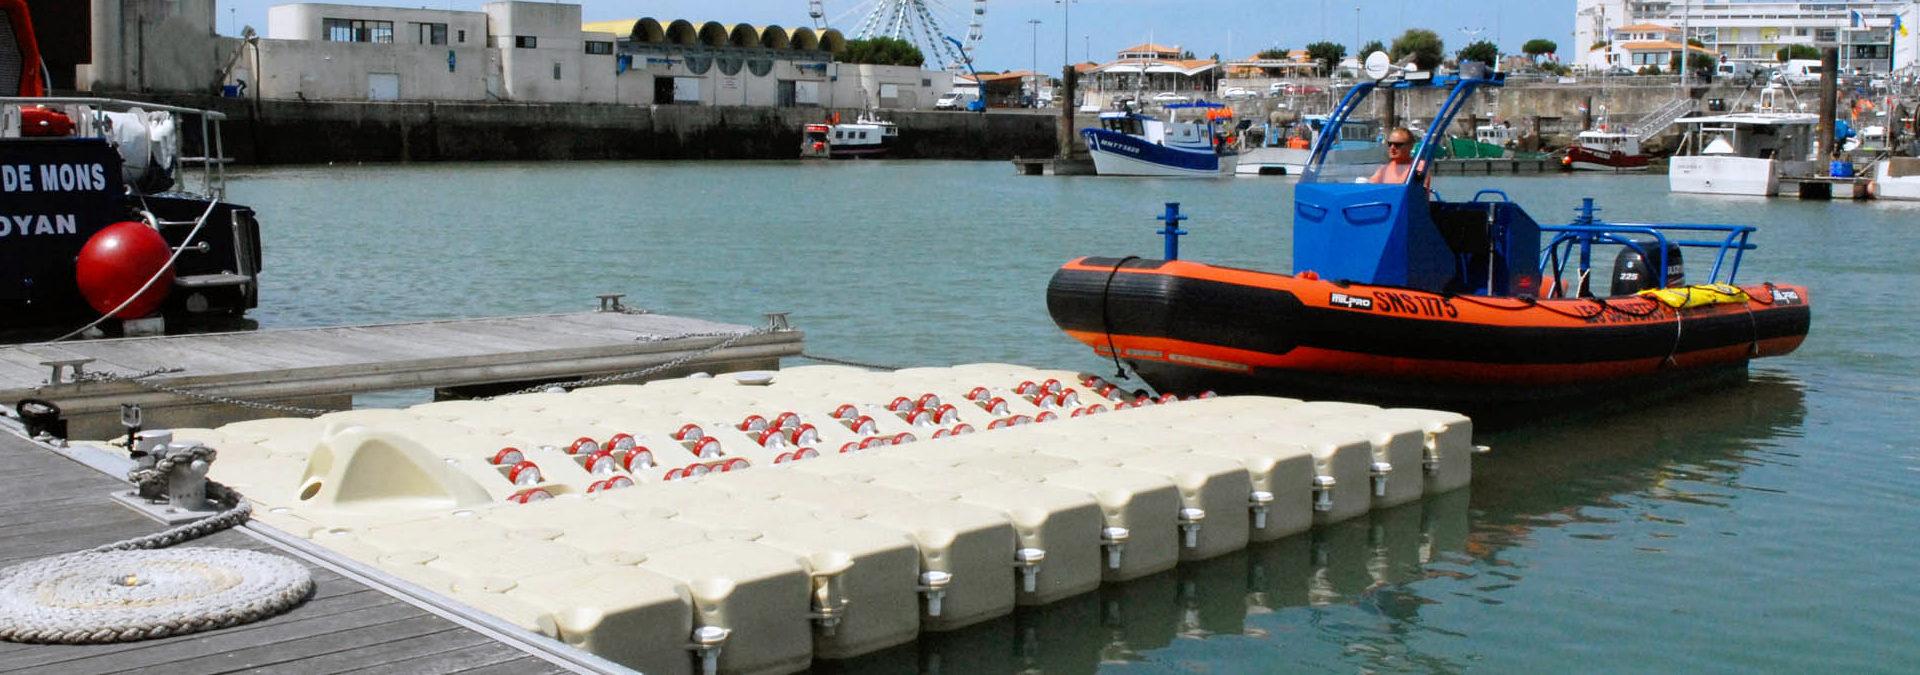 boatlift-tekne-platformu-2